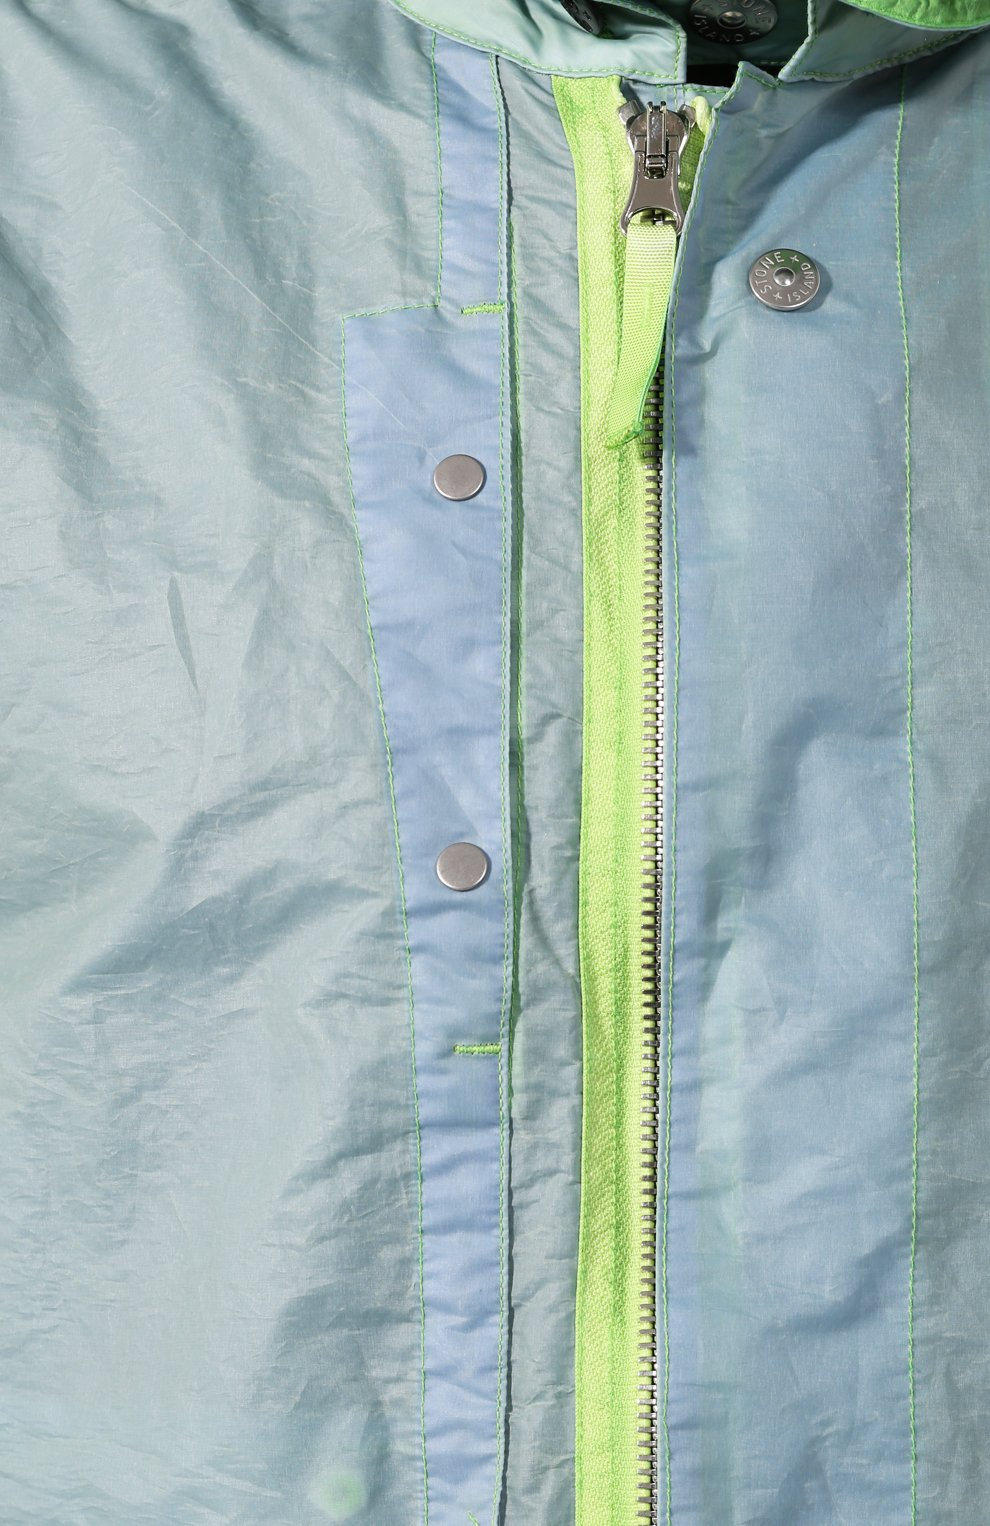 Мужской плащ STONE ISLAND SHADOW PROJECT светло-зеленого цвета, арт. 721970105 | Фото 5